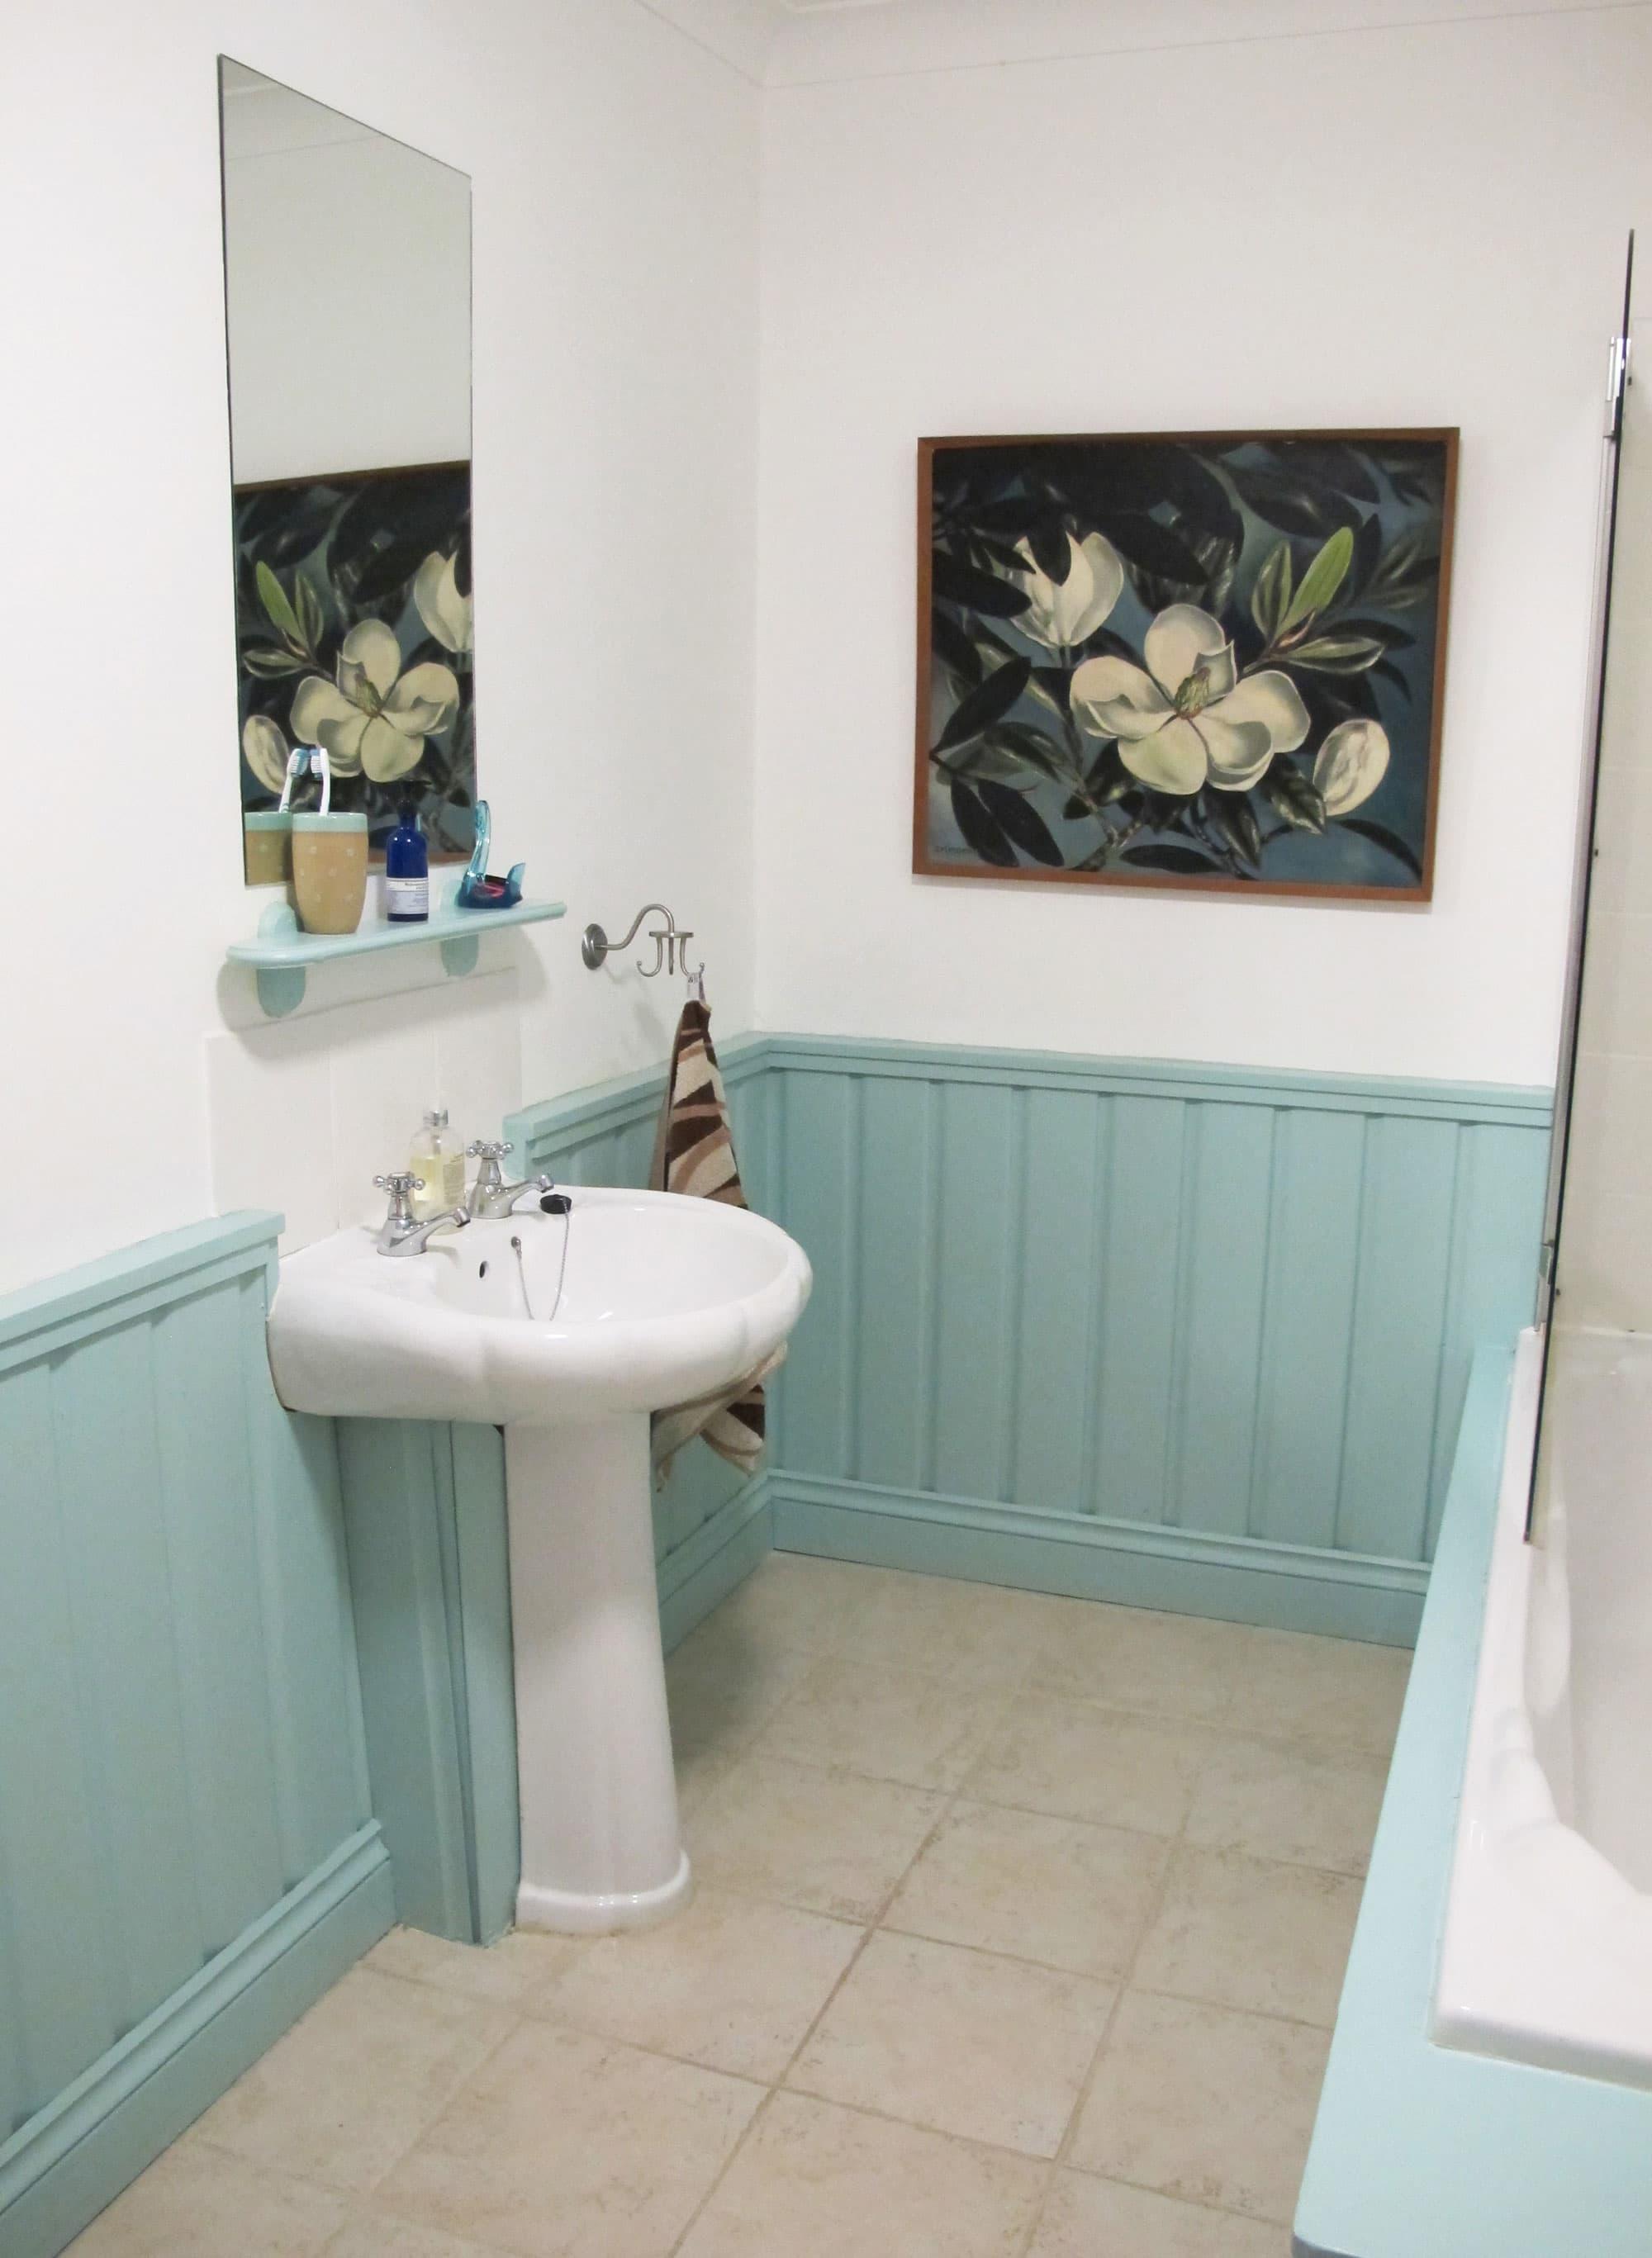 Lesley's Cozy Cool UK Coastal Home: gallery image 18